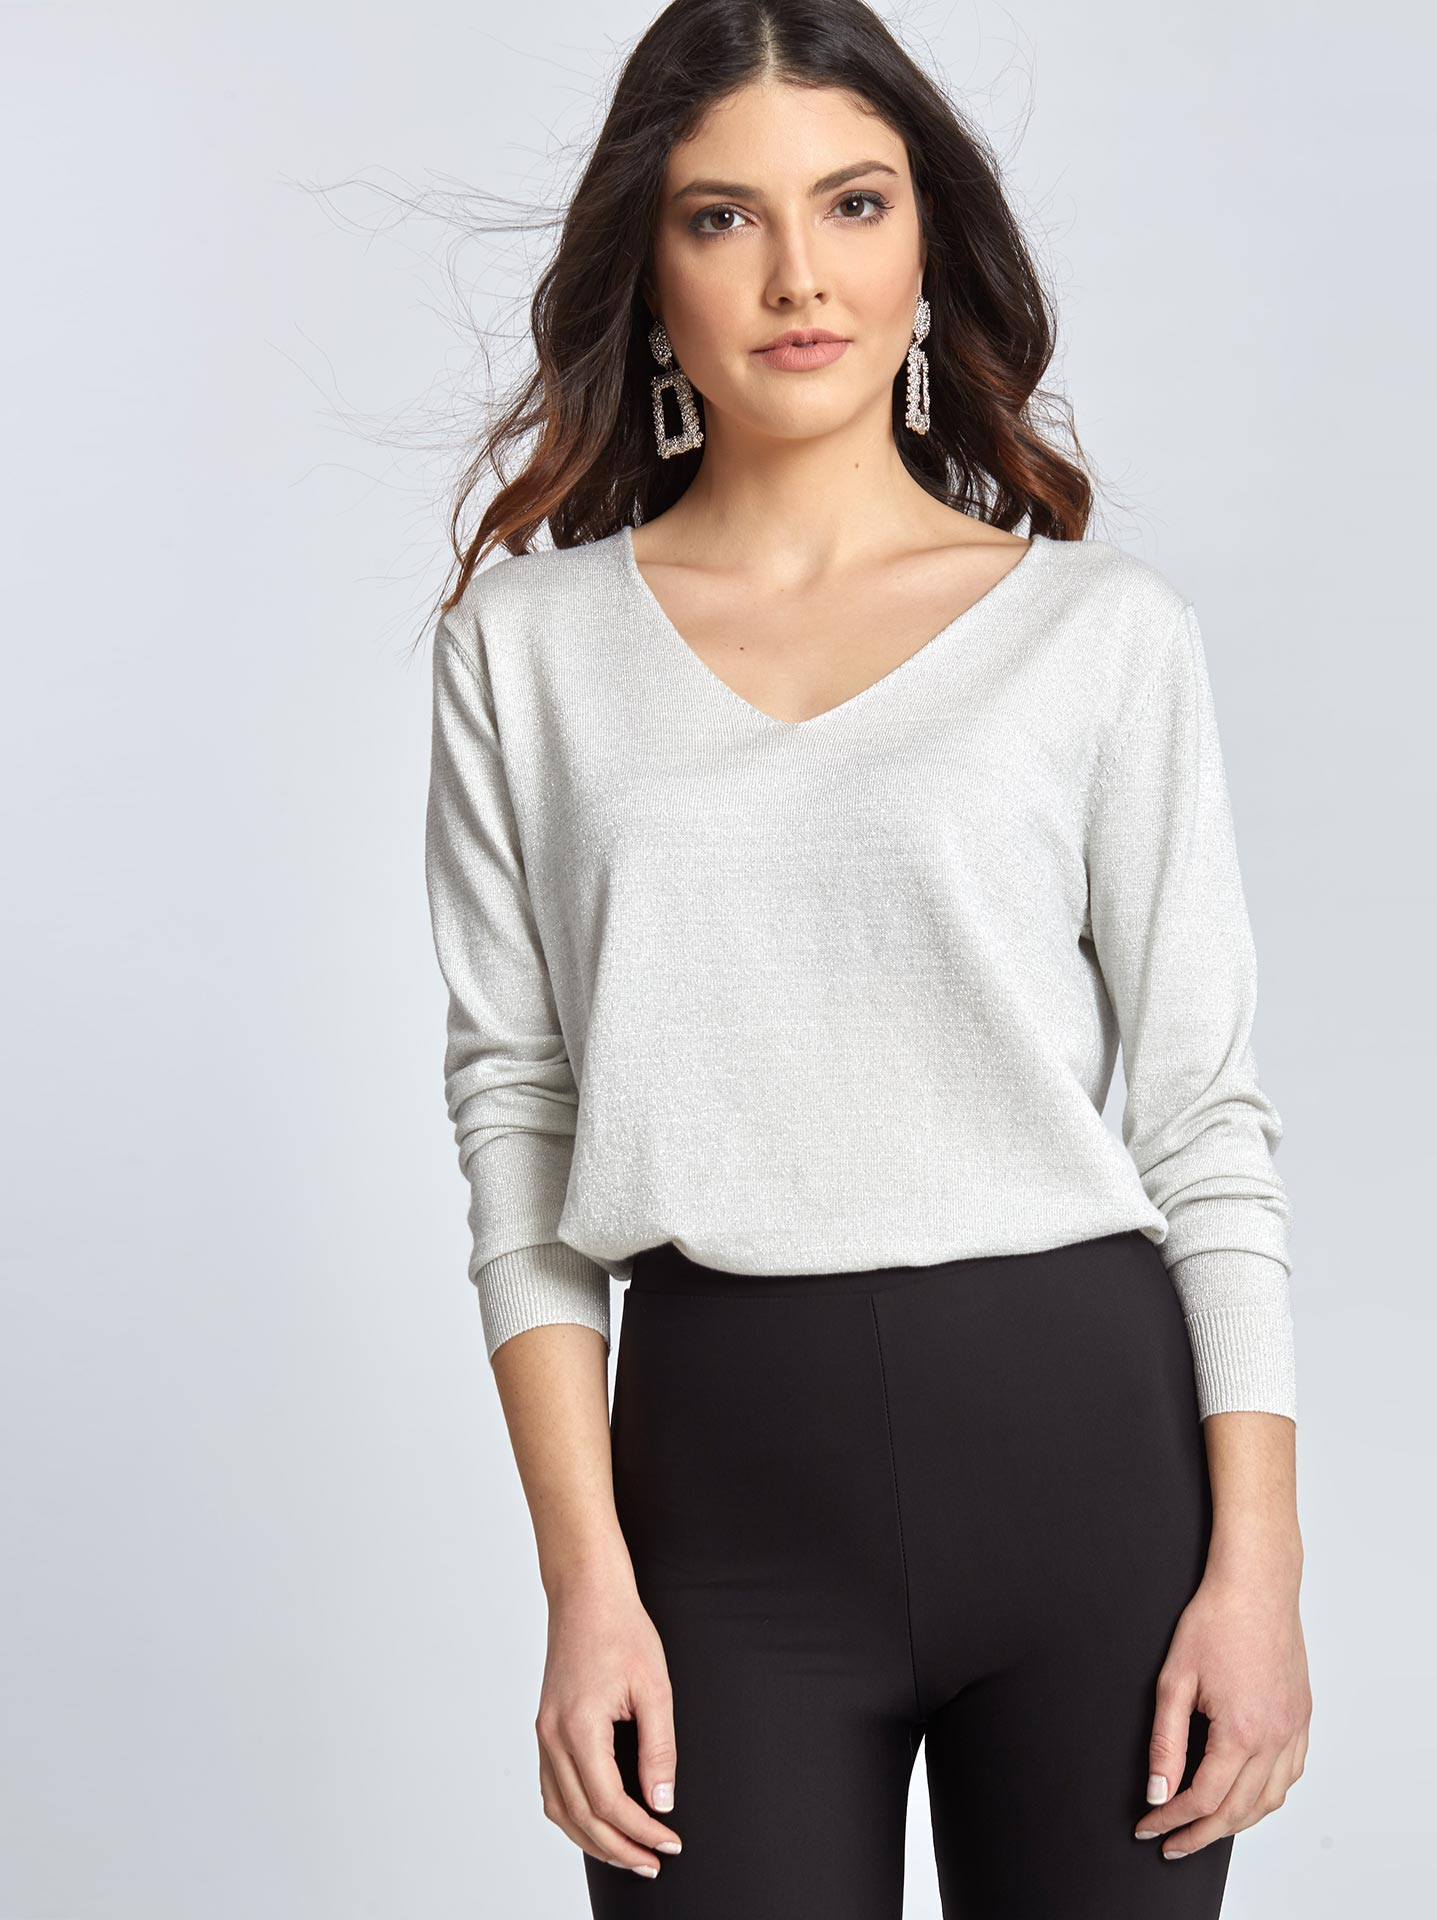 88a77f0f54e5 Μεταλλιζέ πουλόβερ σε λευκο